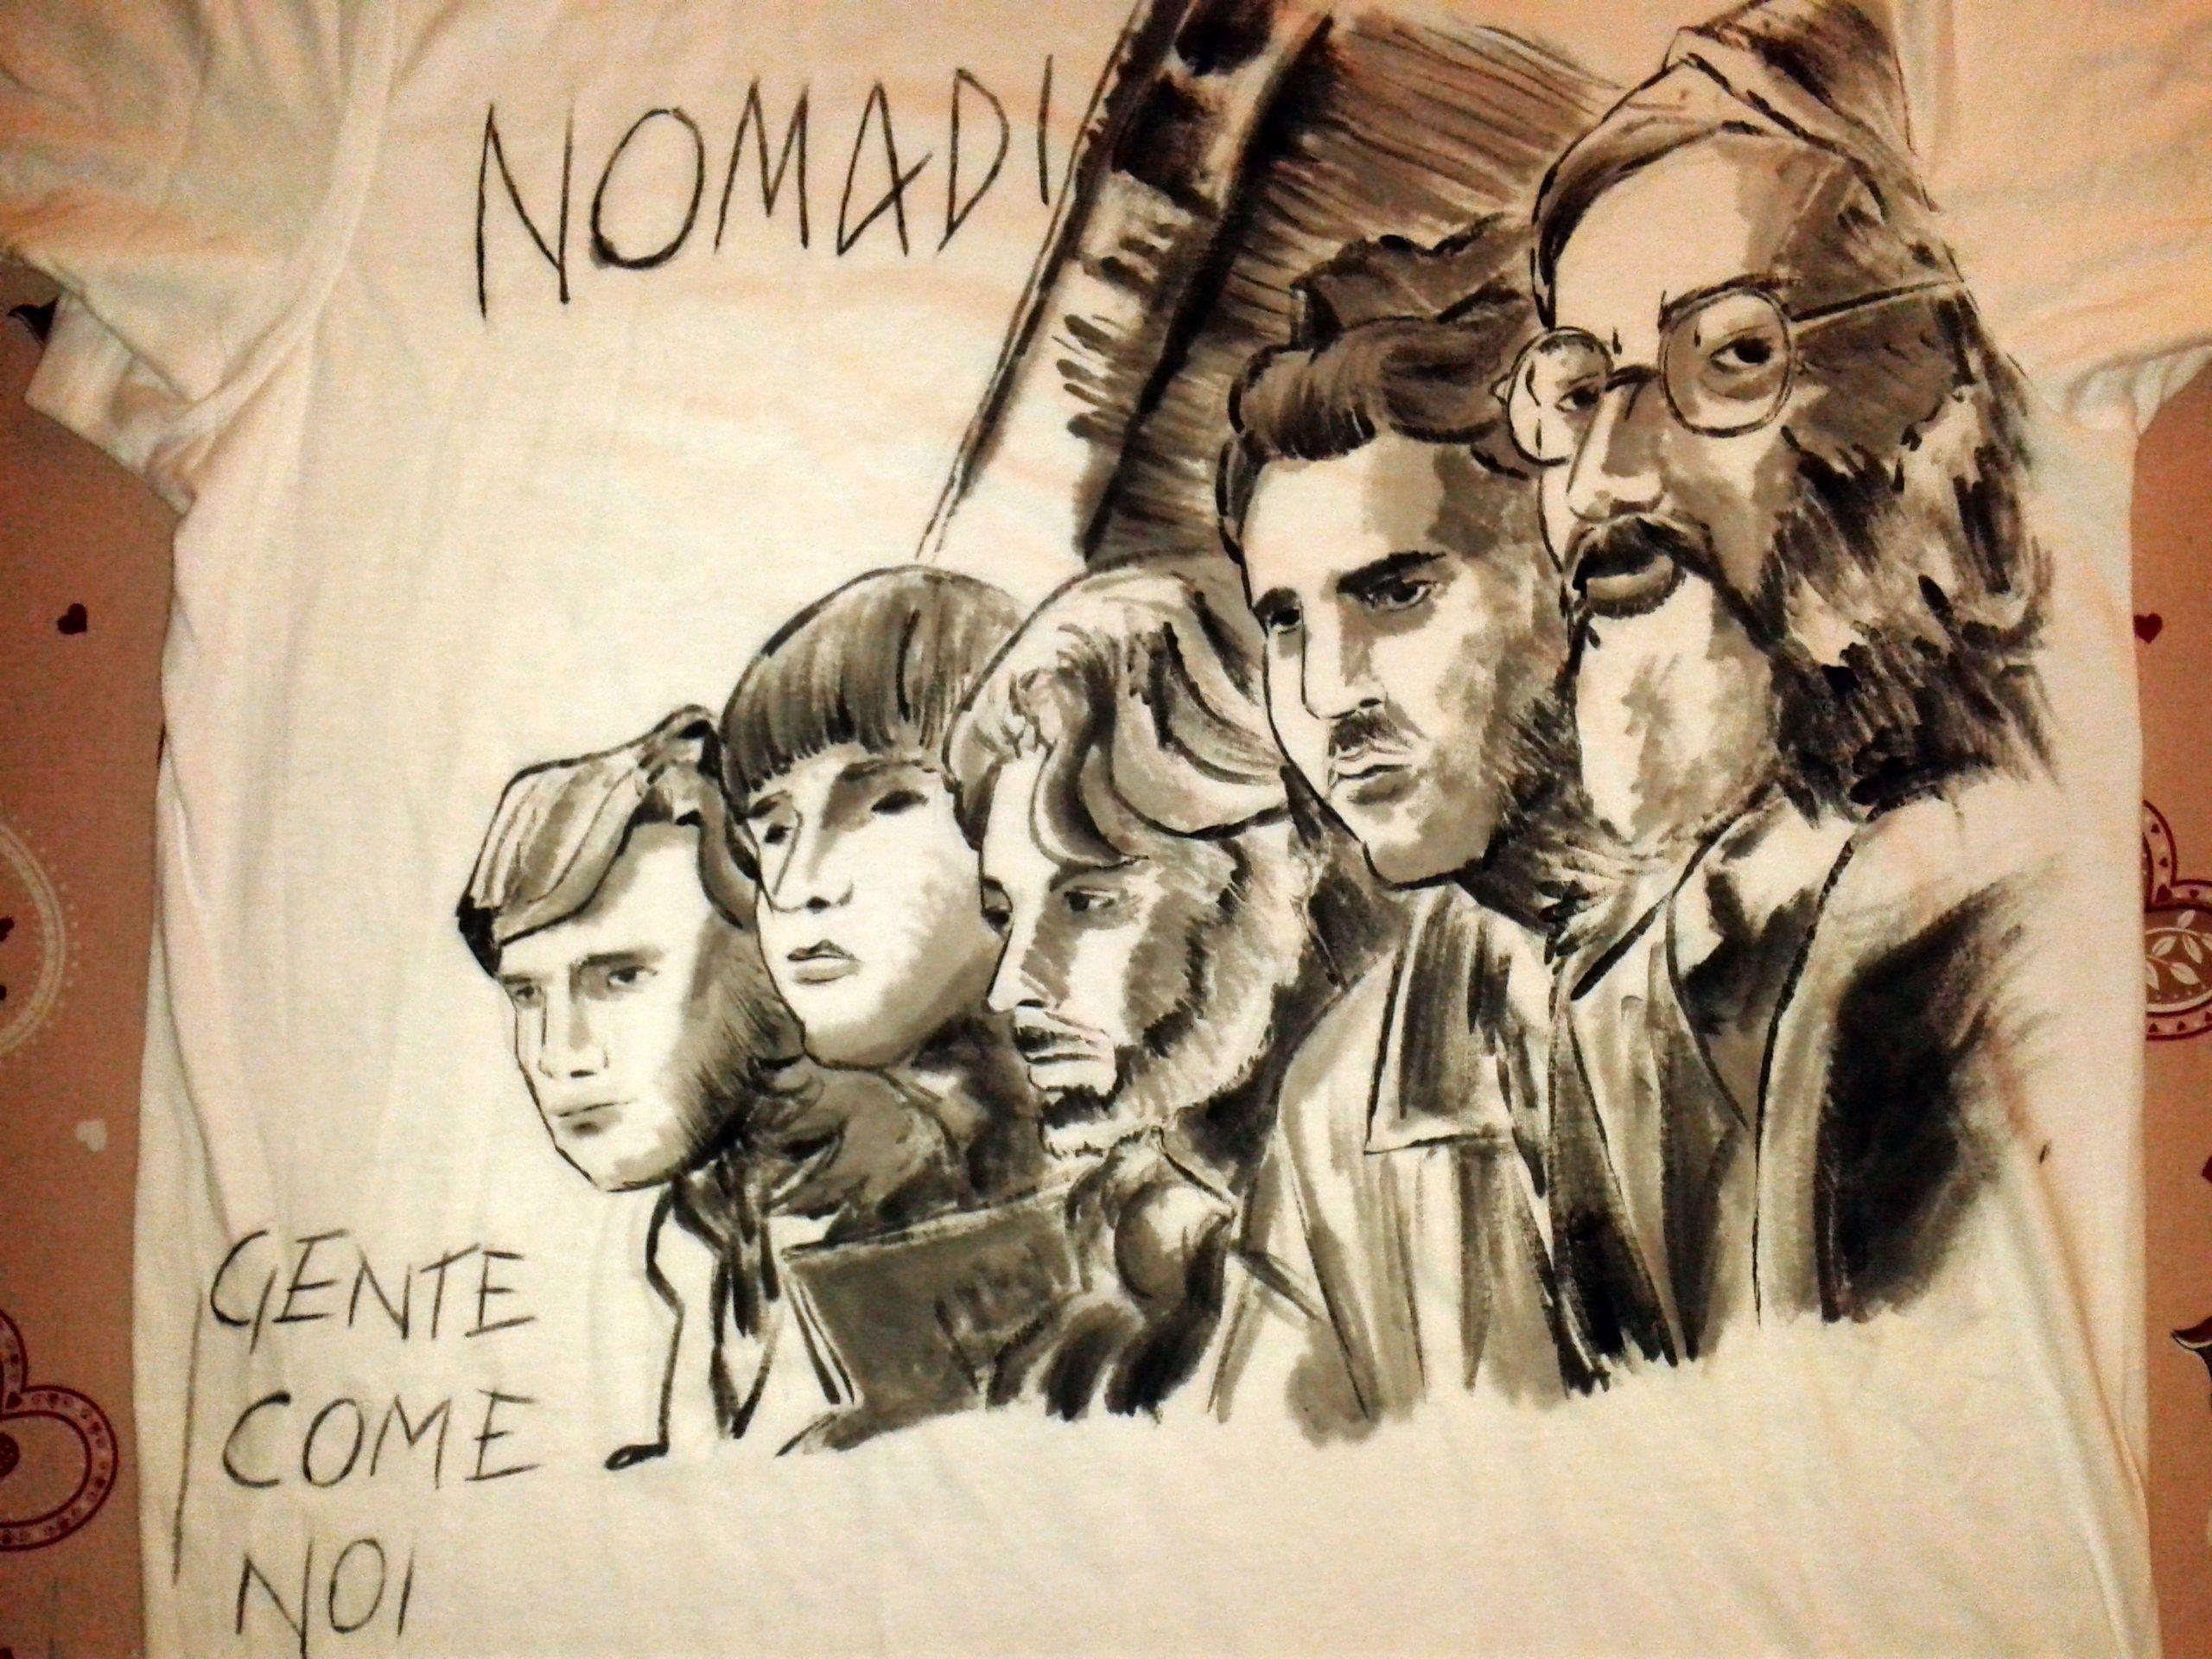 "Cover ""Gente come noi"" dei NOMADI su tshirt  #paintingontshirt #handmade #handpainted #dariodevito #nomadi #augustodaolio #maglietta #lavorosucommissione #blackandwhite #realistic #tshirt #fanart #artwork #echoesofcolors"